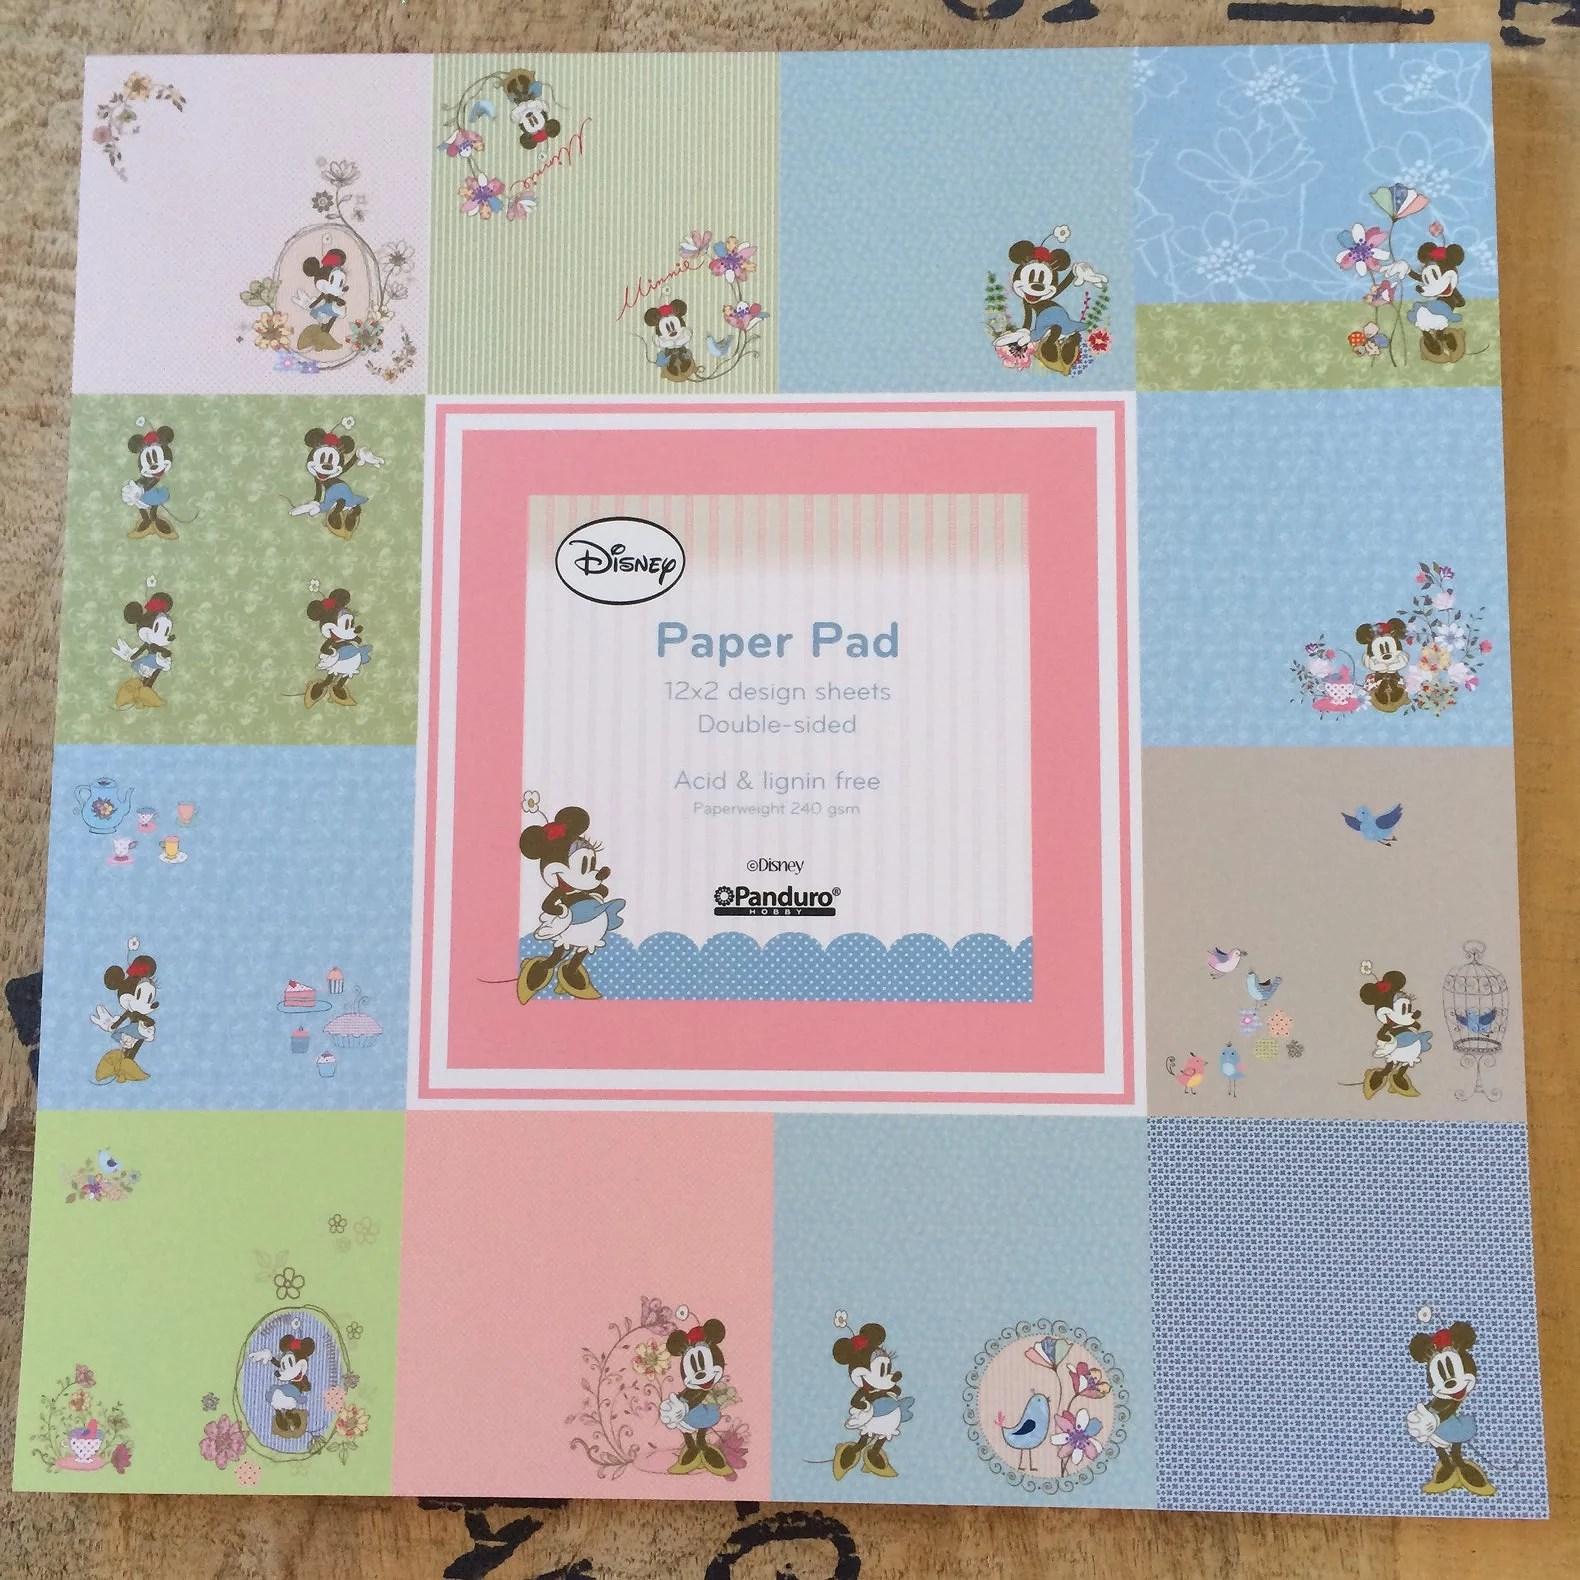 Disney Paper Pads från Panduro